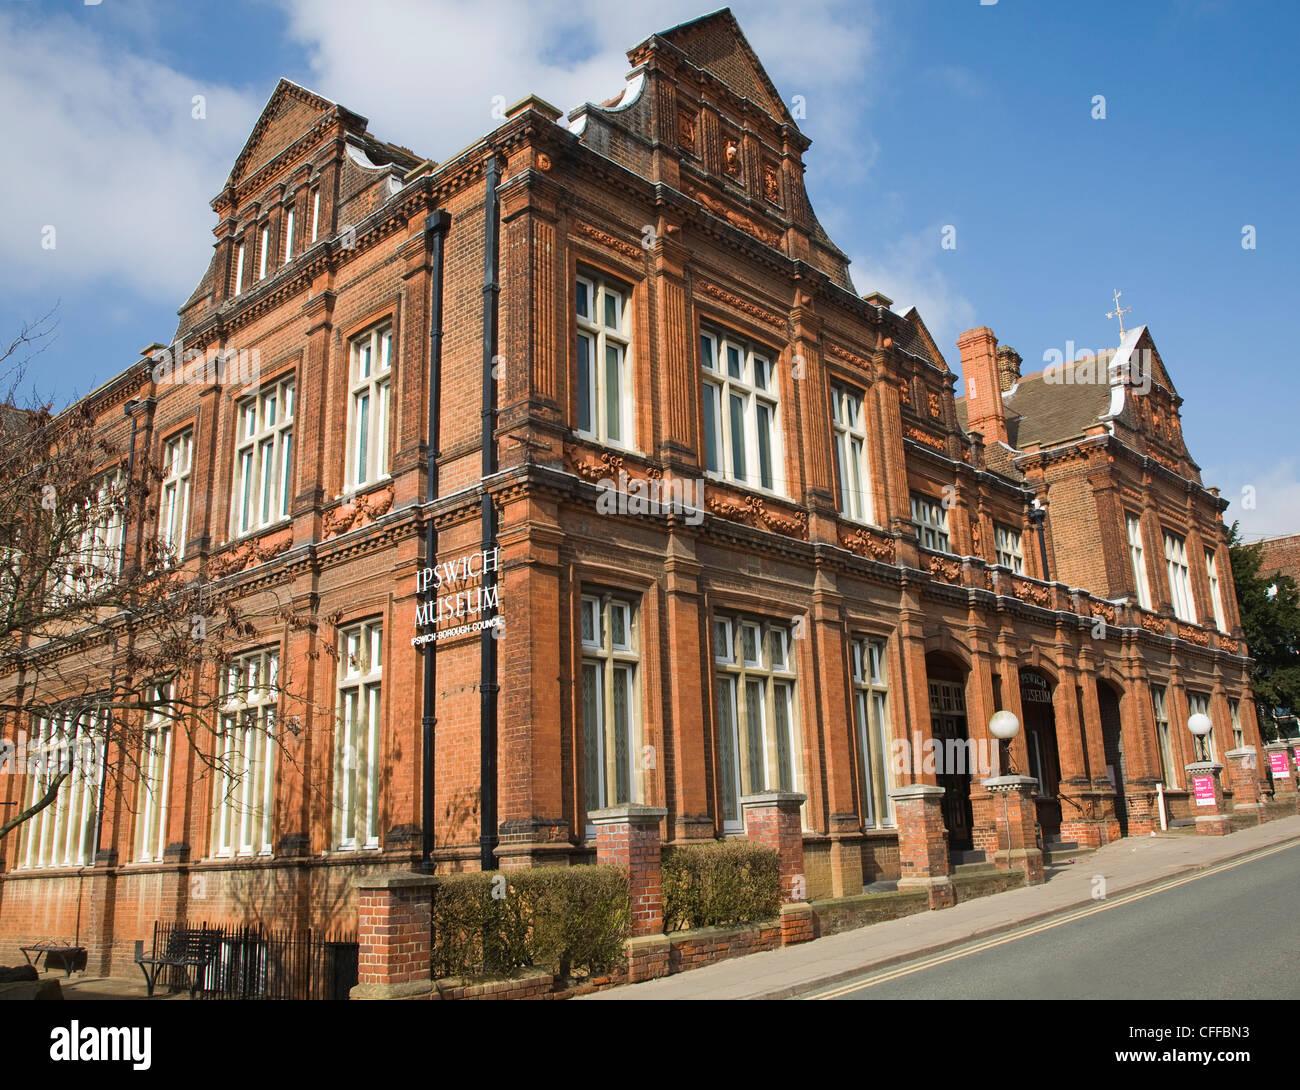 Victorian red brick building Ipswich museum built 1880, Ipswich, Suffolk, England - Stock Image